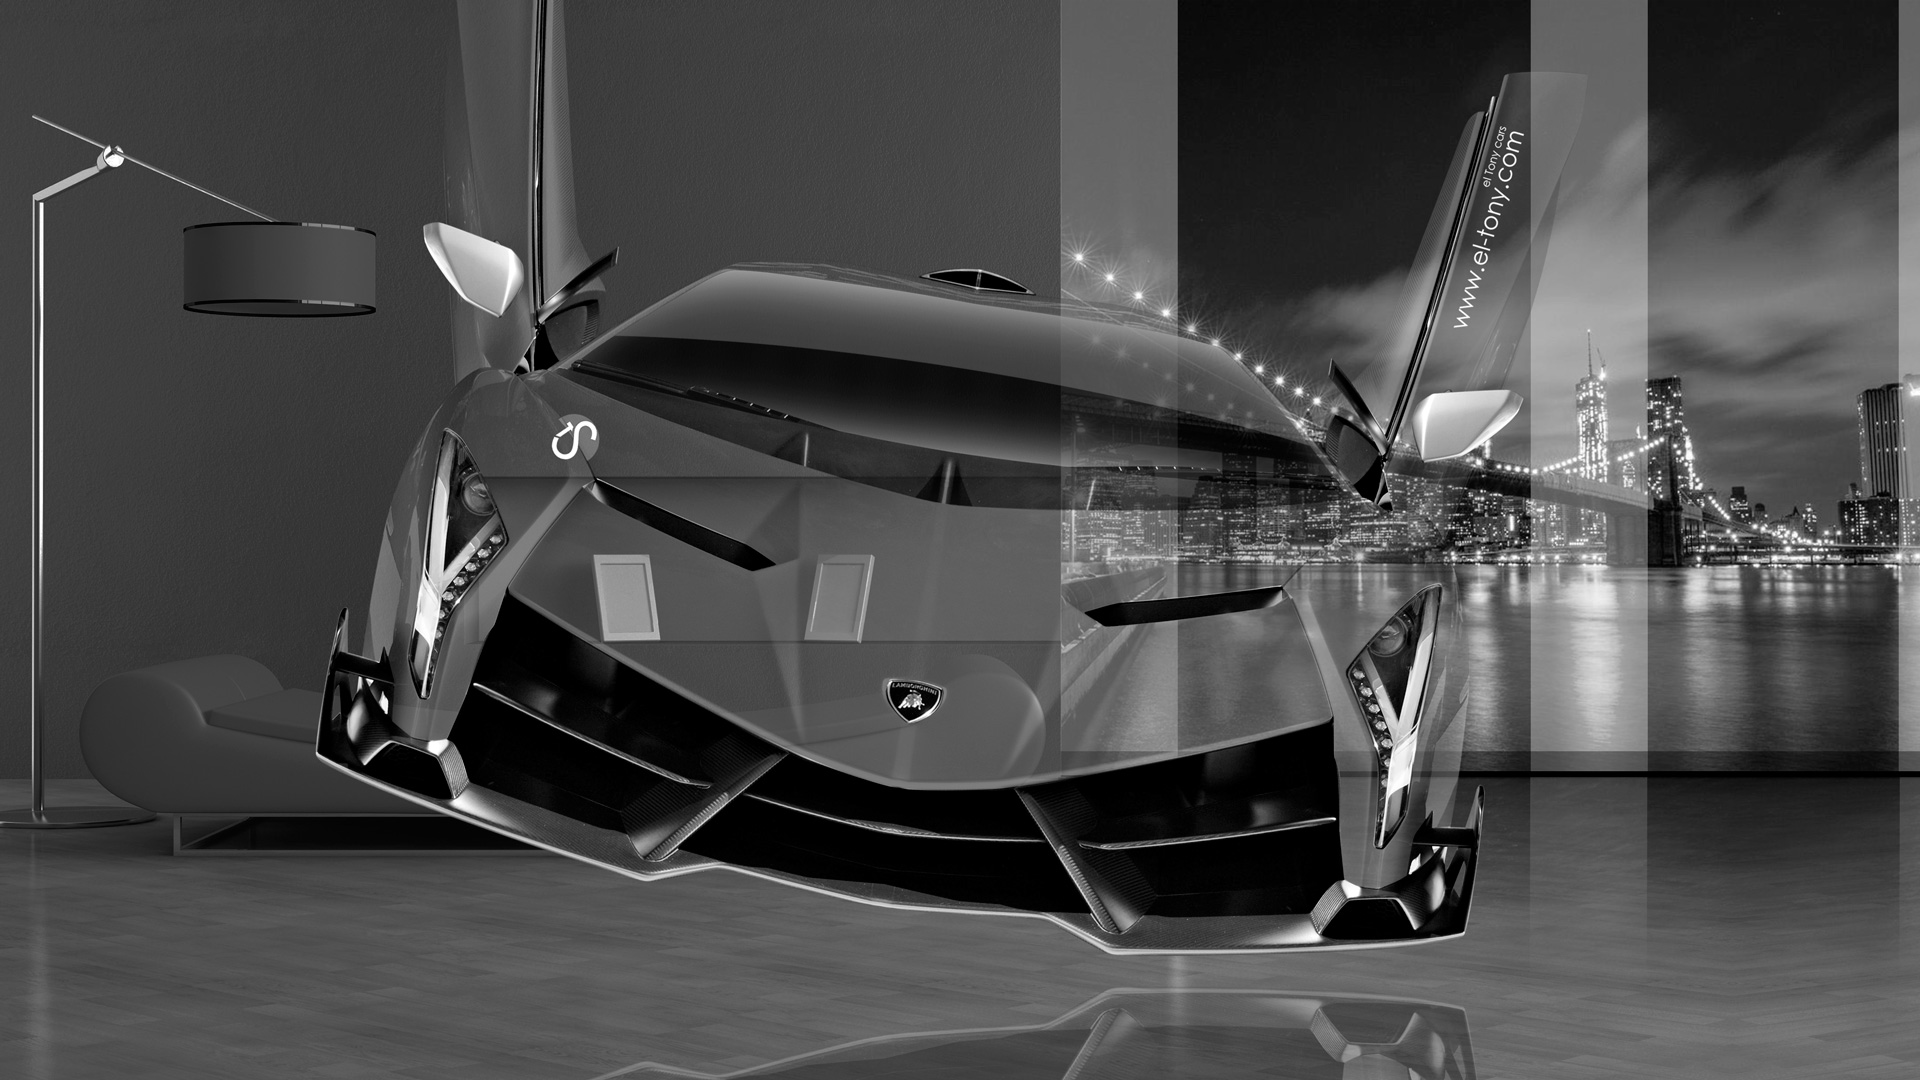 Lamborghini Veneno Open Doors Fantasy Crystal Home Fly Car 2014 Hd